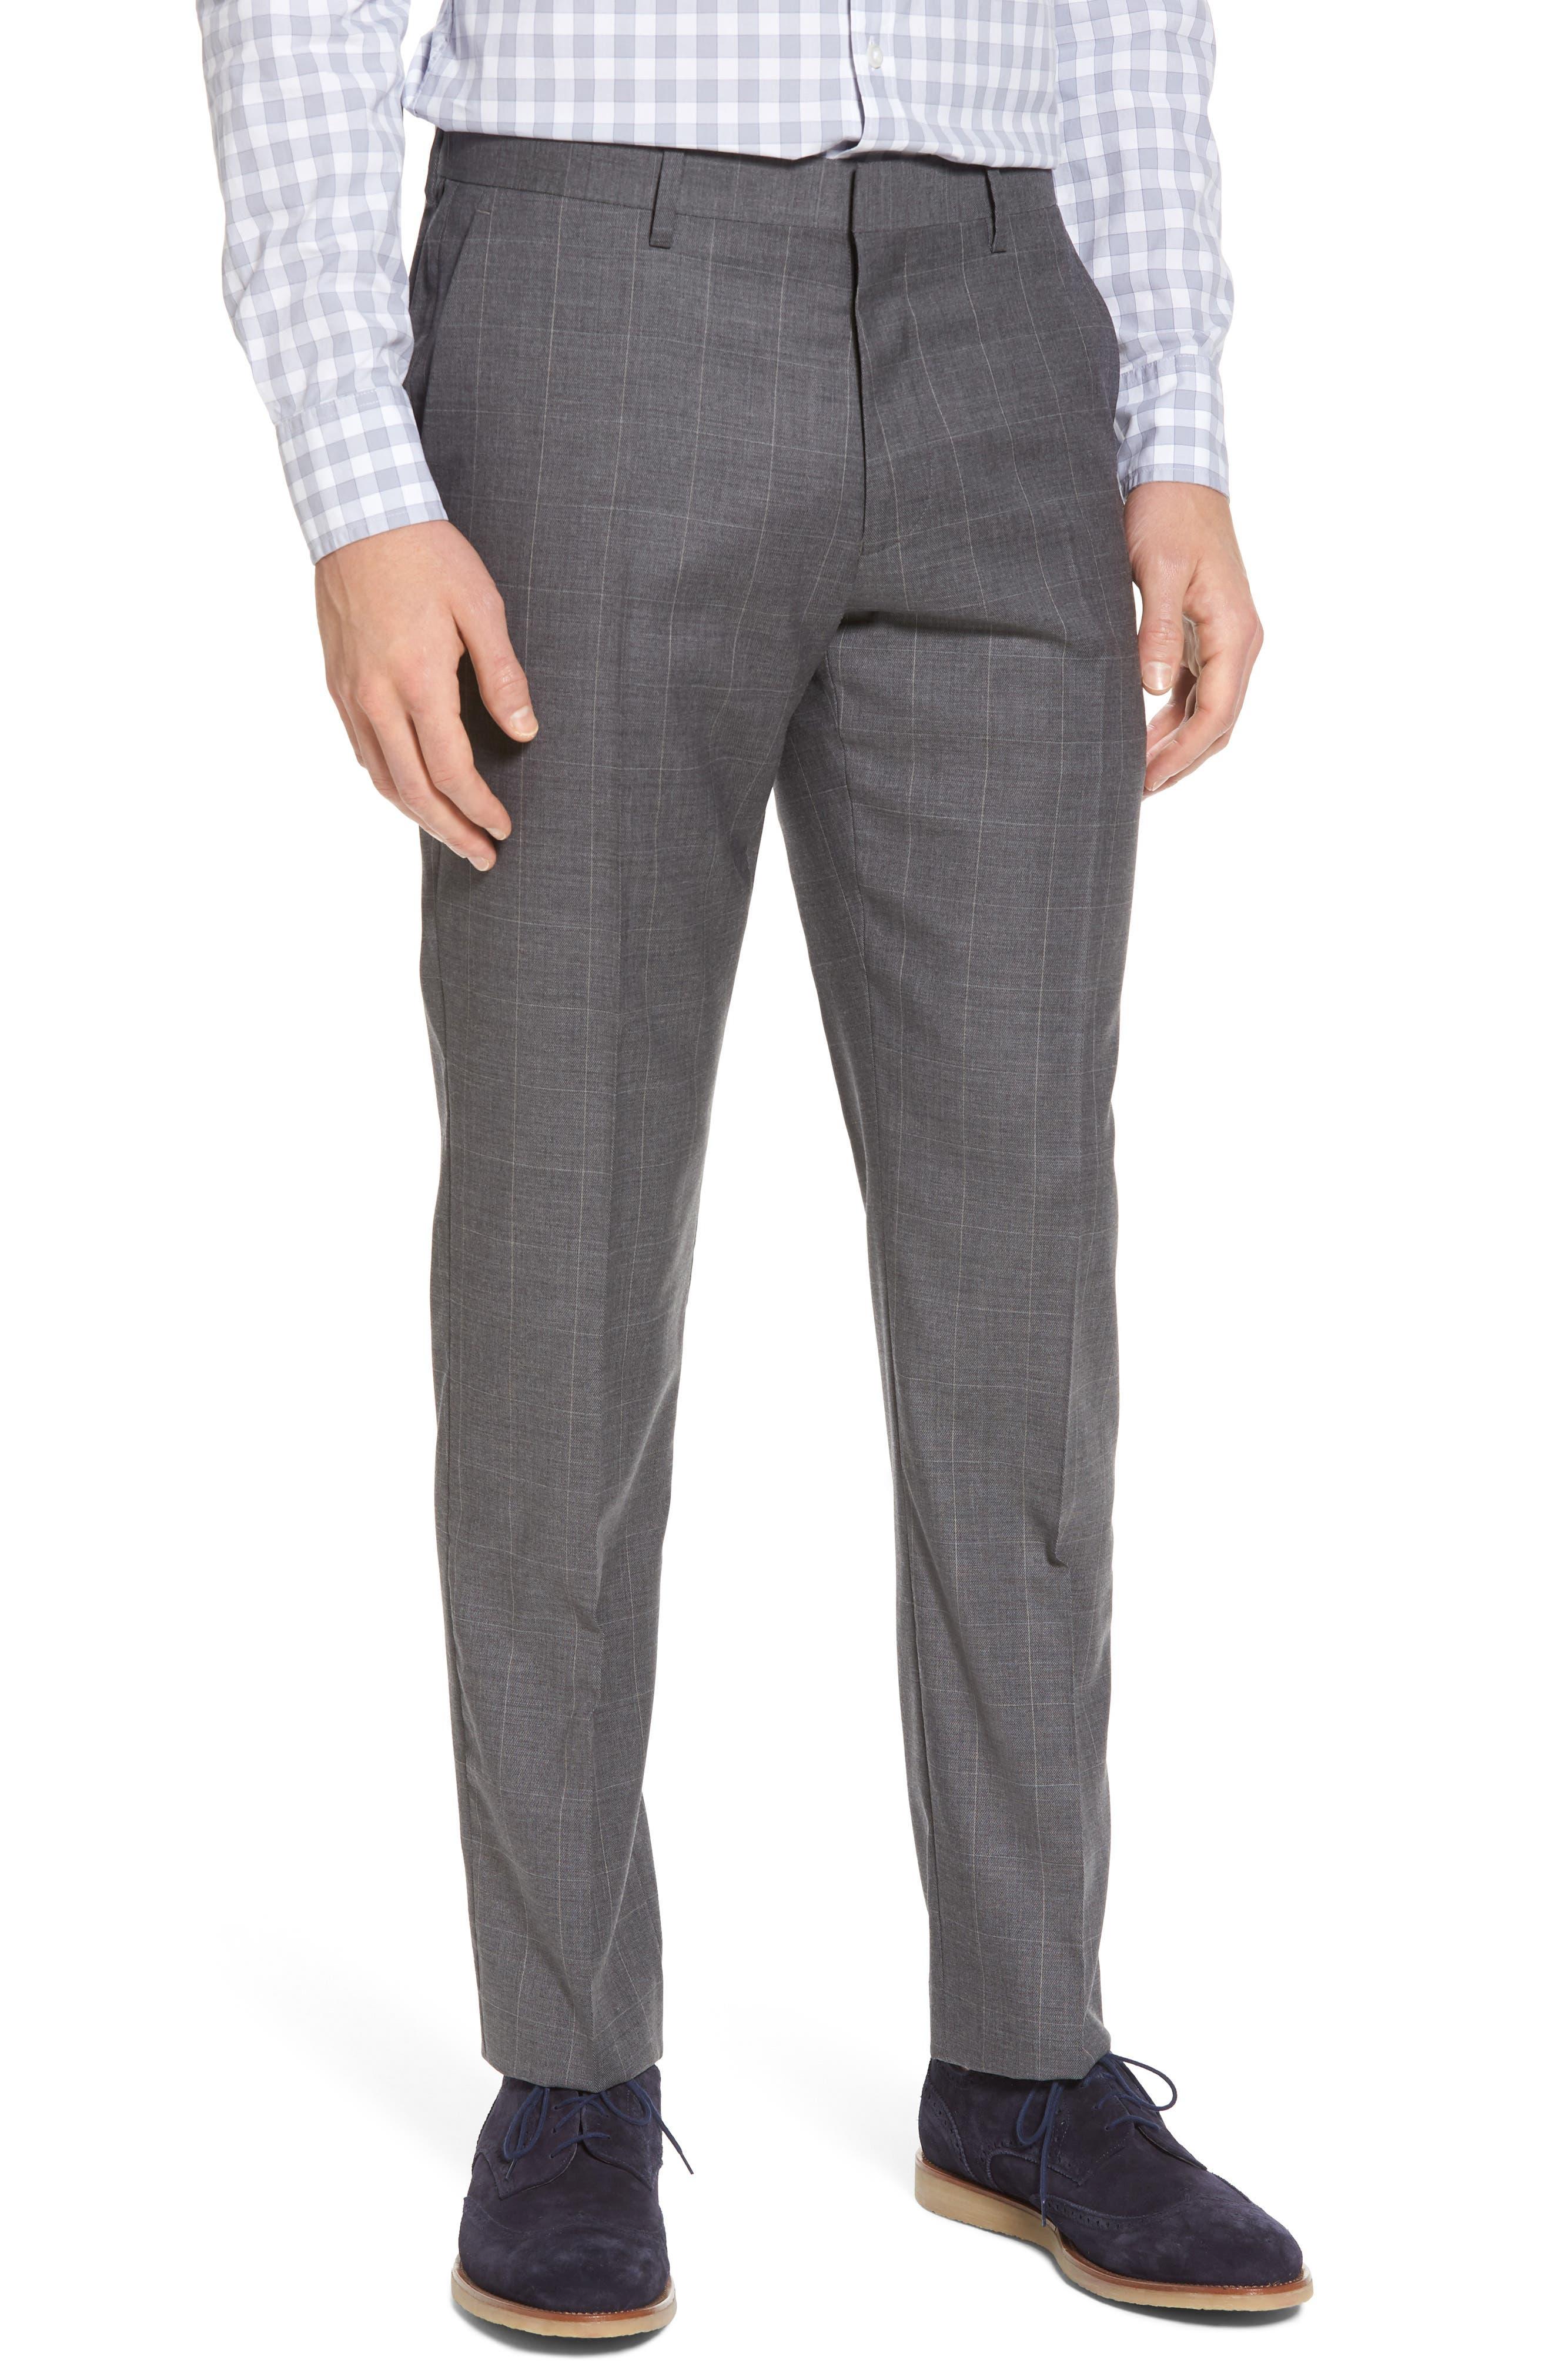 J.Crew Ludlow Wool Blend Pants